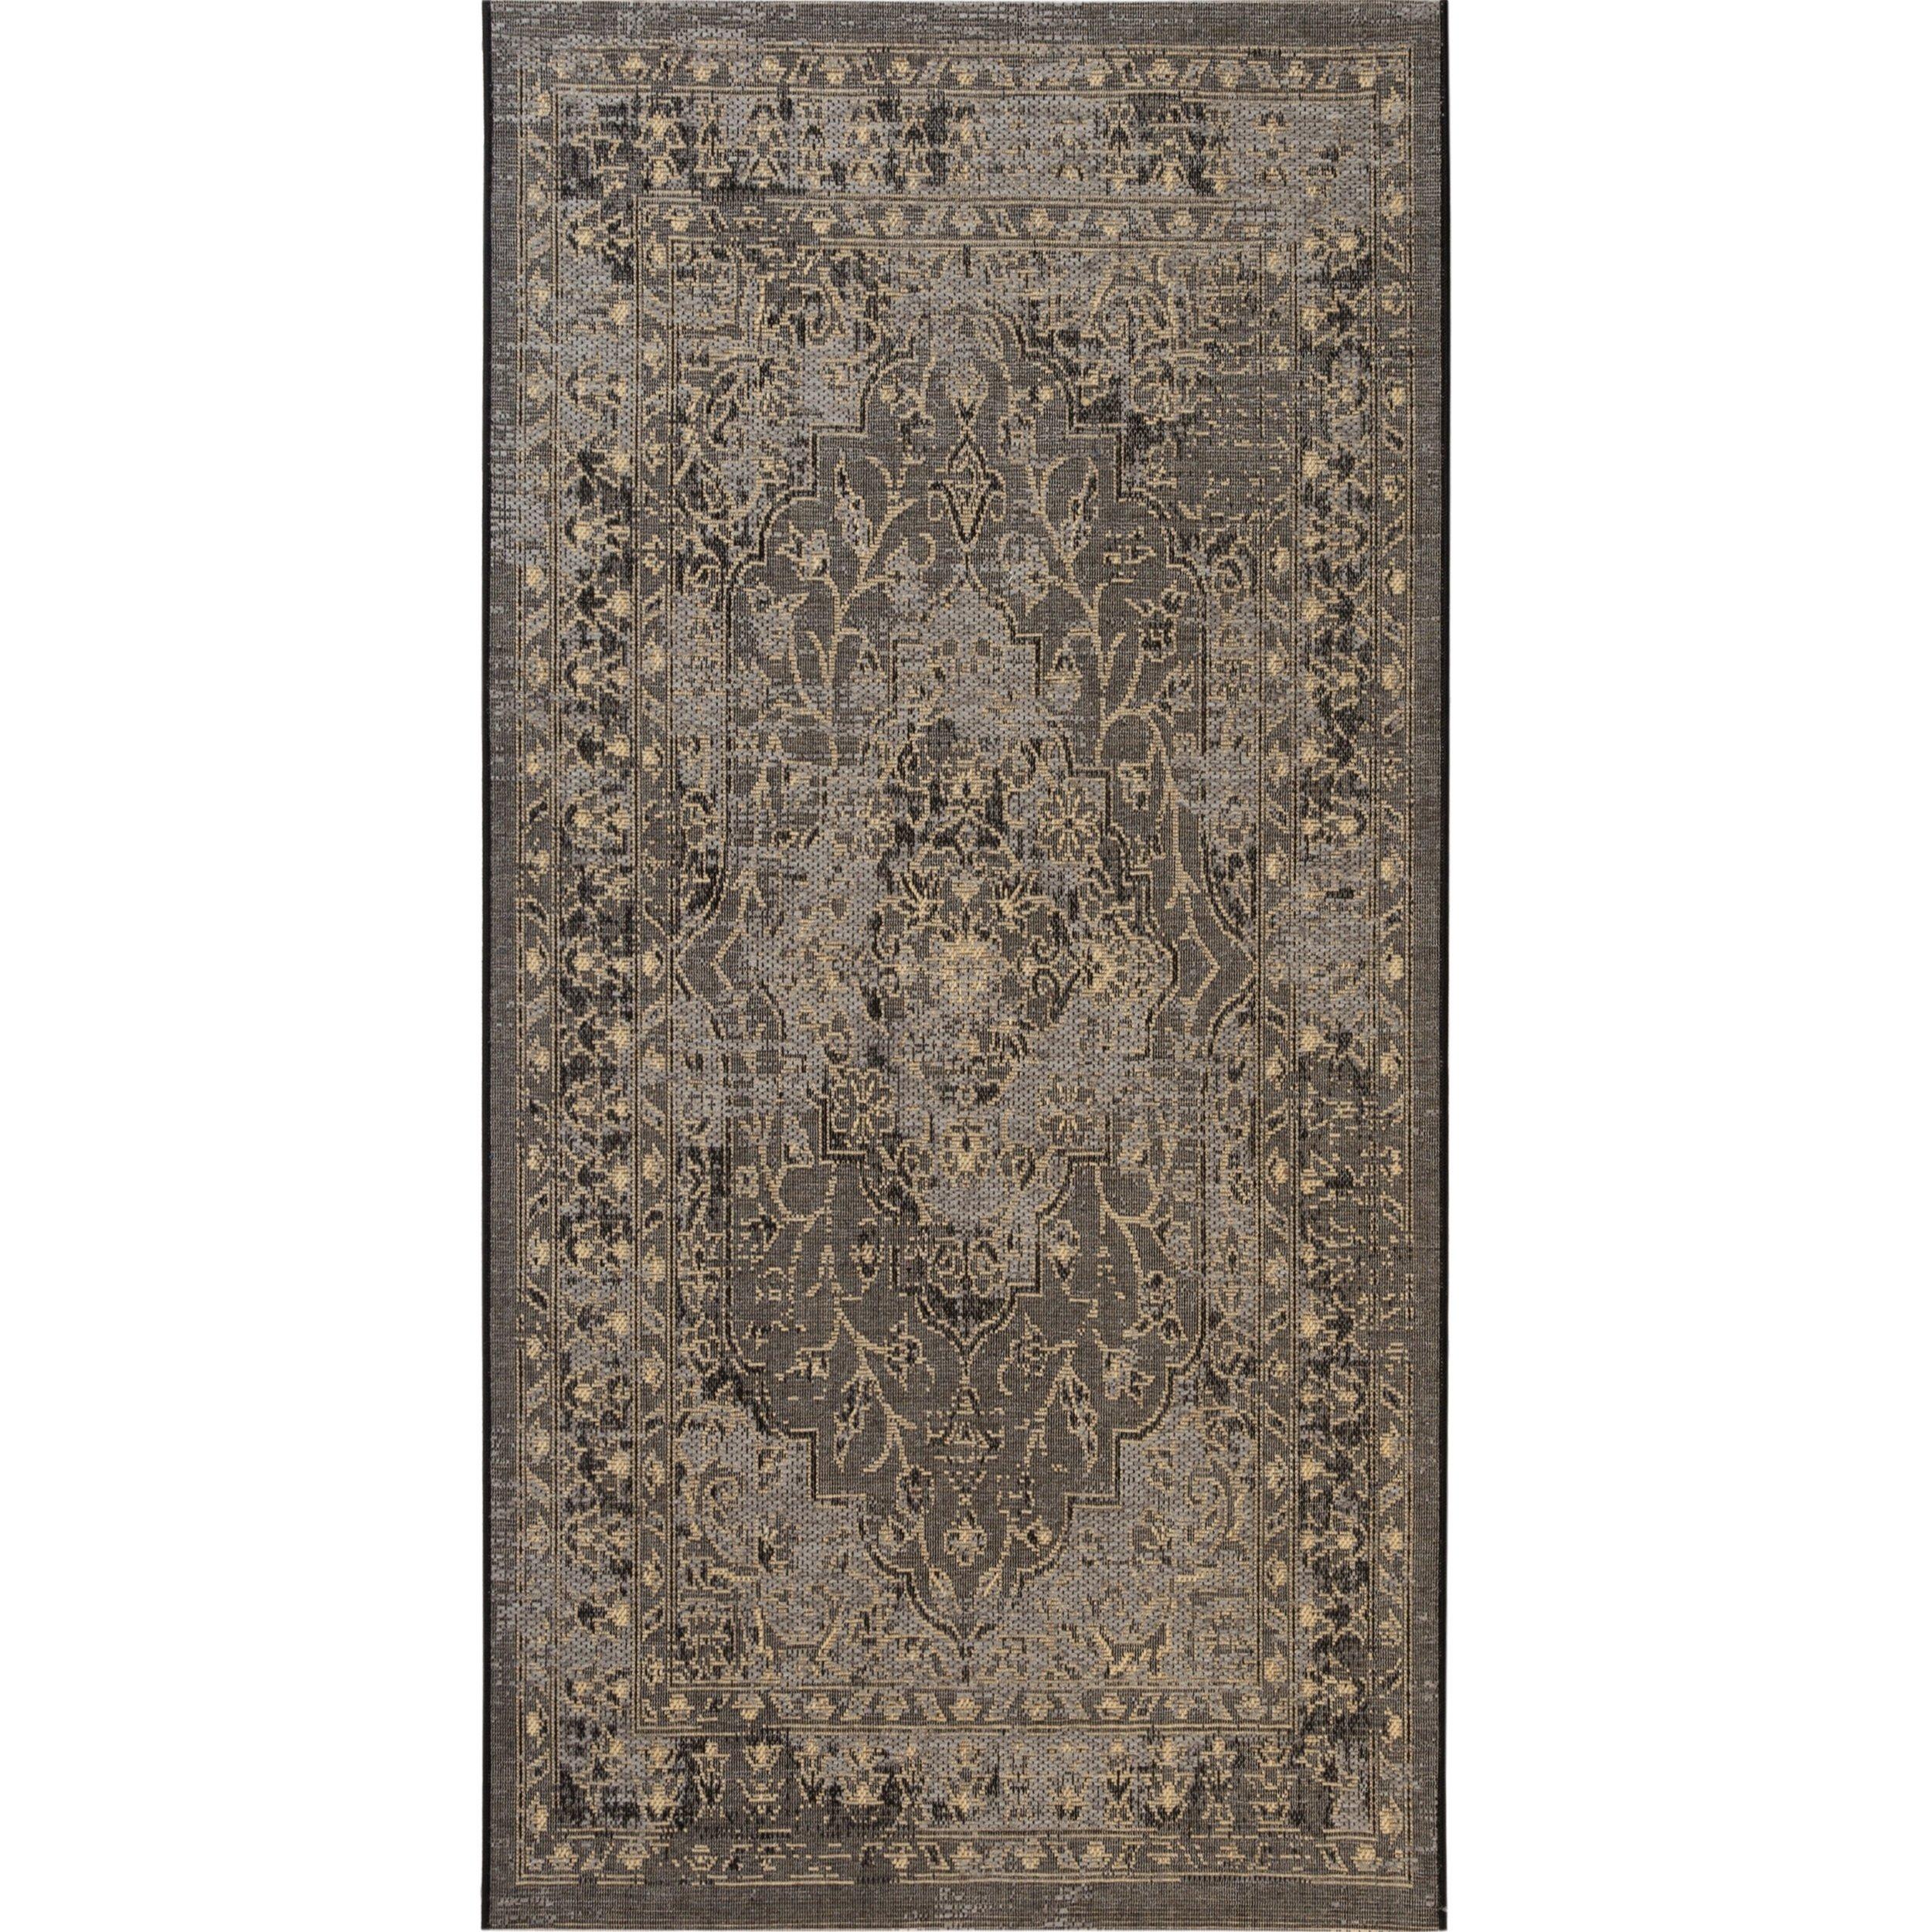 Safavieh Palazzo Collection PAL128-1621 Black and Cream Area Rug (2'6'' x 5')